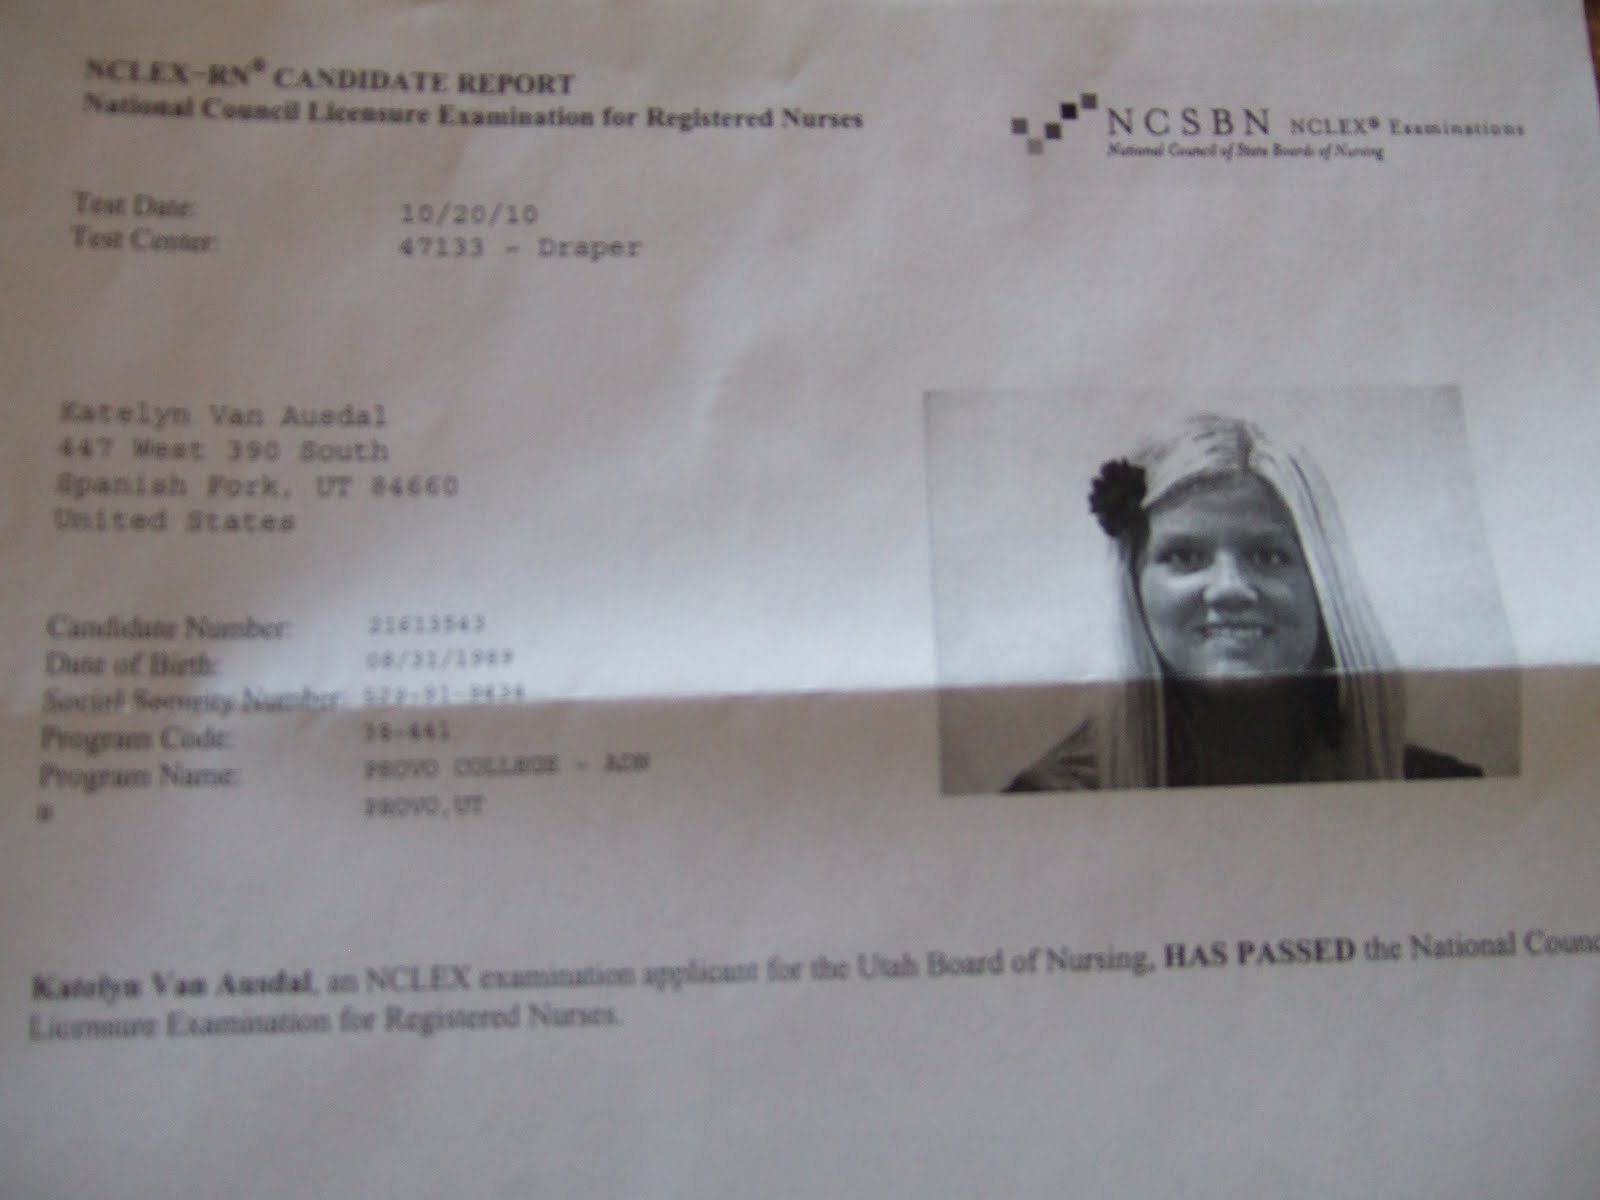 The Van Ausdal S Registered Nurse Finally